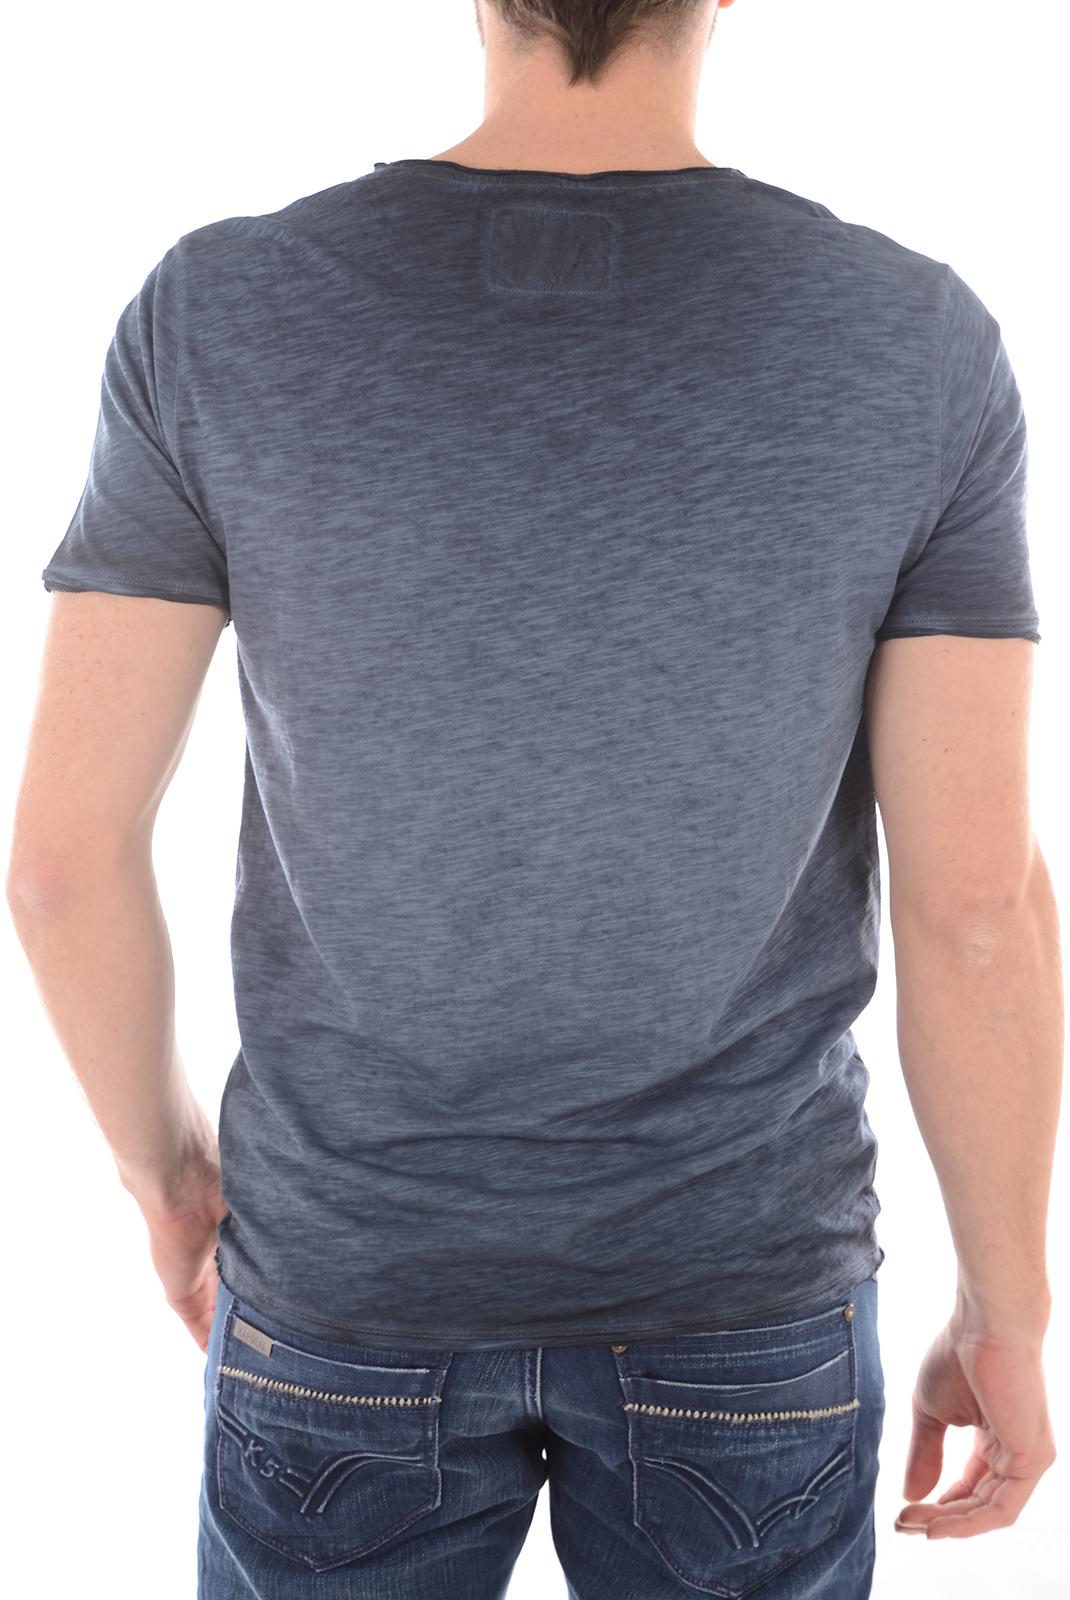 Tee-shirts  Guess jeans M61P35K2X80 G720 BLEU